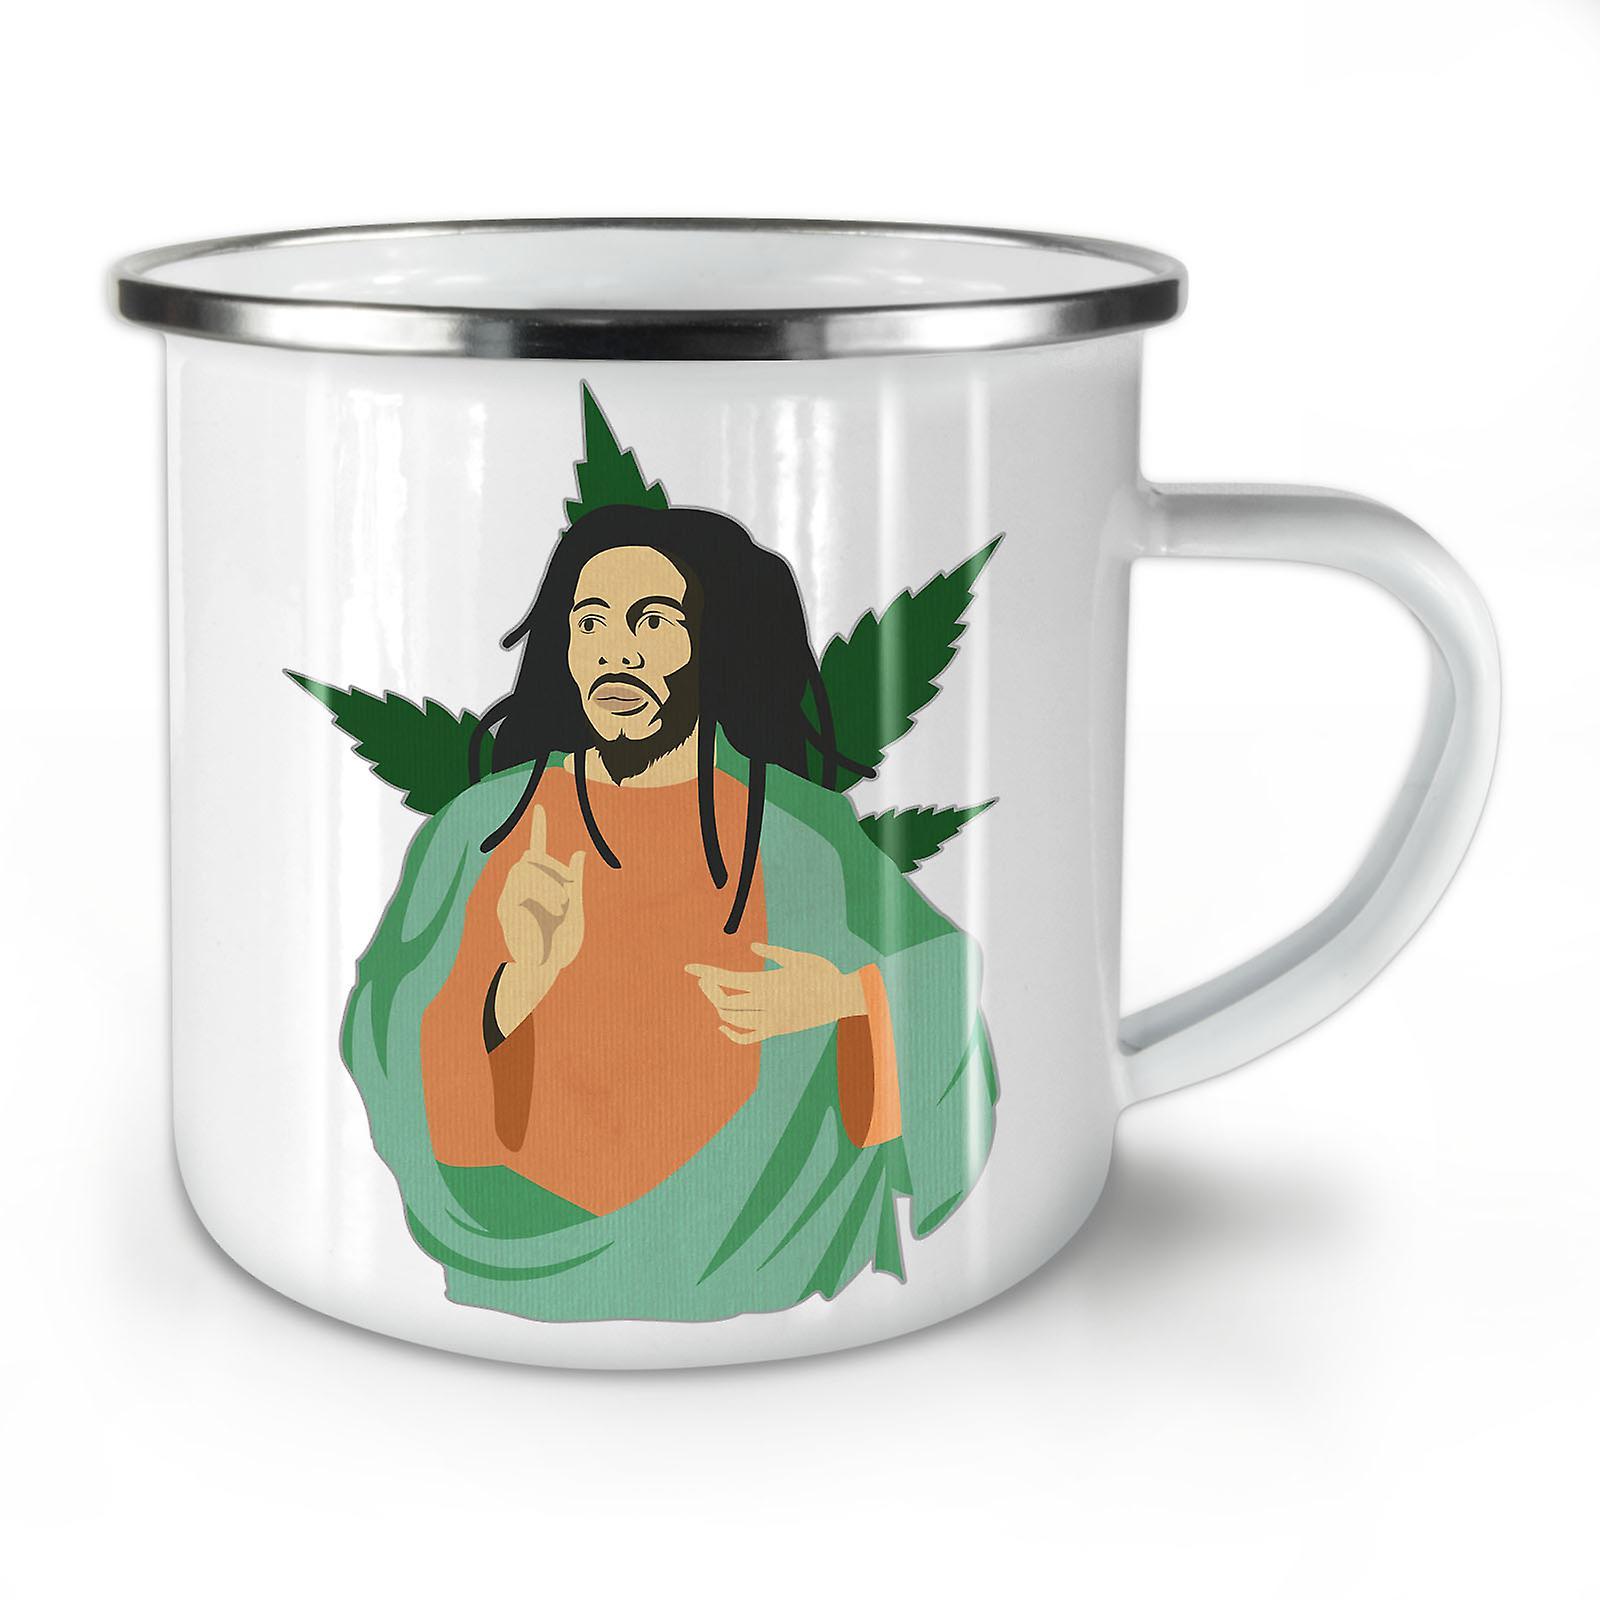 Nouveau Whitetea Émail Café Marley Dieu Mauvaises Herbes Mug10 OzWellcoda HD29WEI